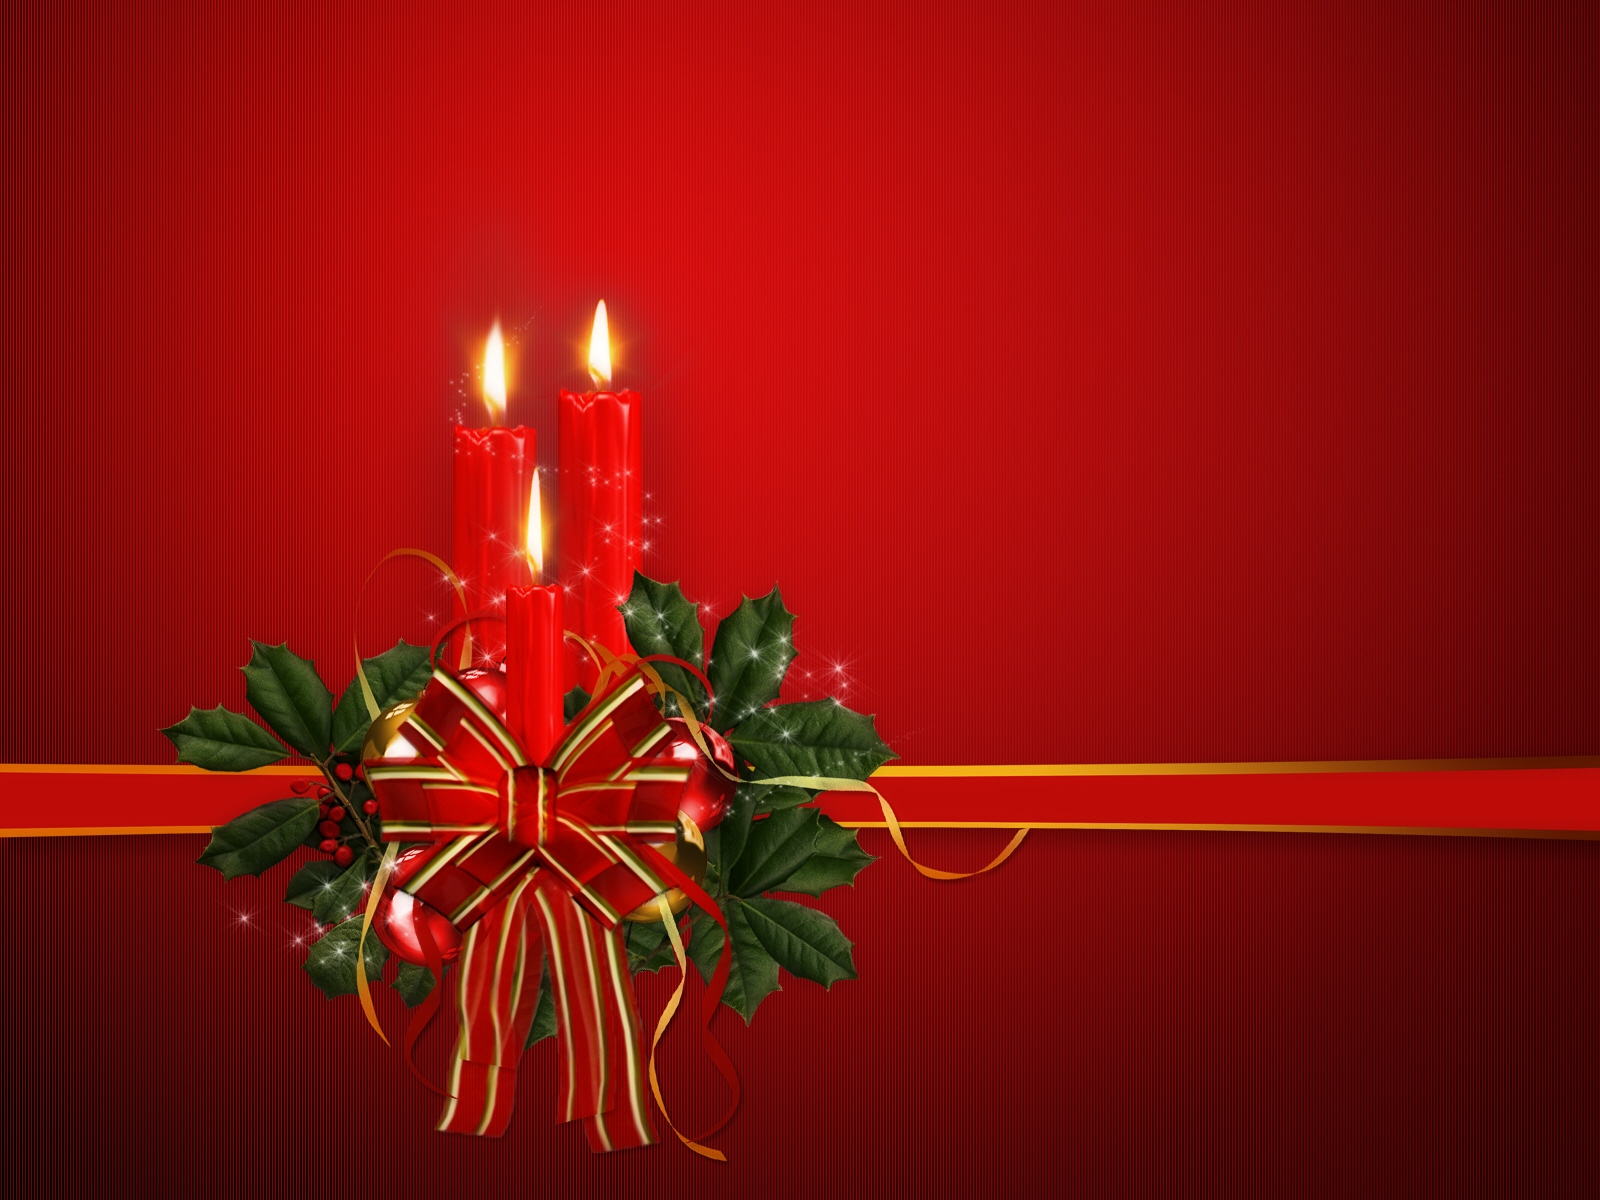 http://1.bp.blogspot.com/-9xfgyKU79PM/UMolY3x7-rI/AAAAAAAAjCg/zvpgUrGNYw8/s1600/xmas-christmas-wallpaper-hq-high-quality-hd-images-wishes-ecard-46.jpg